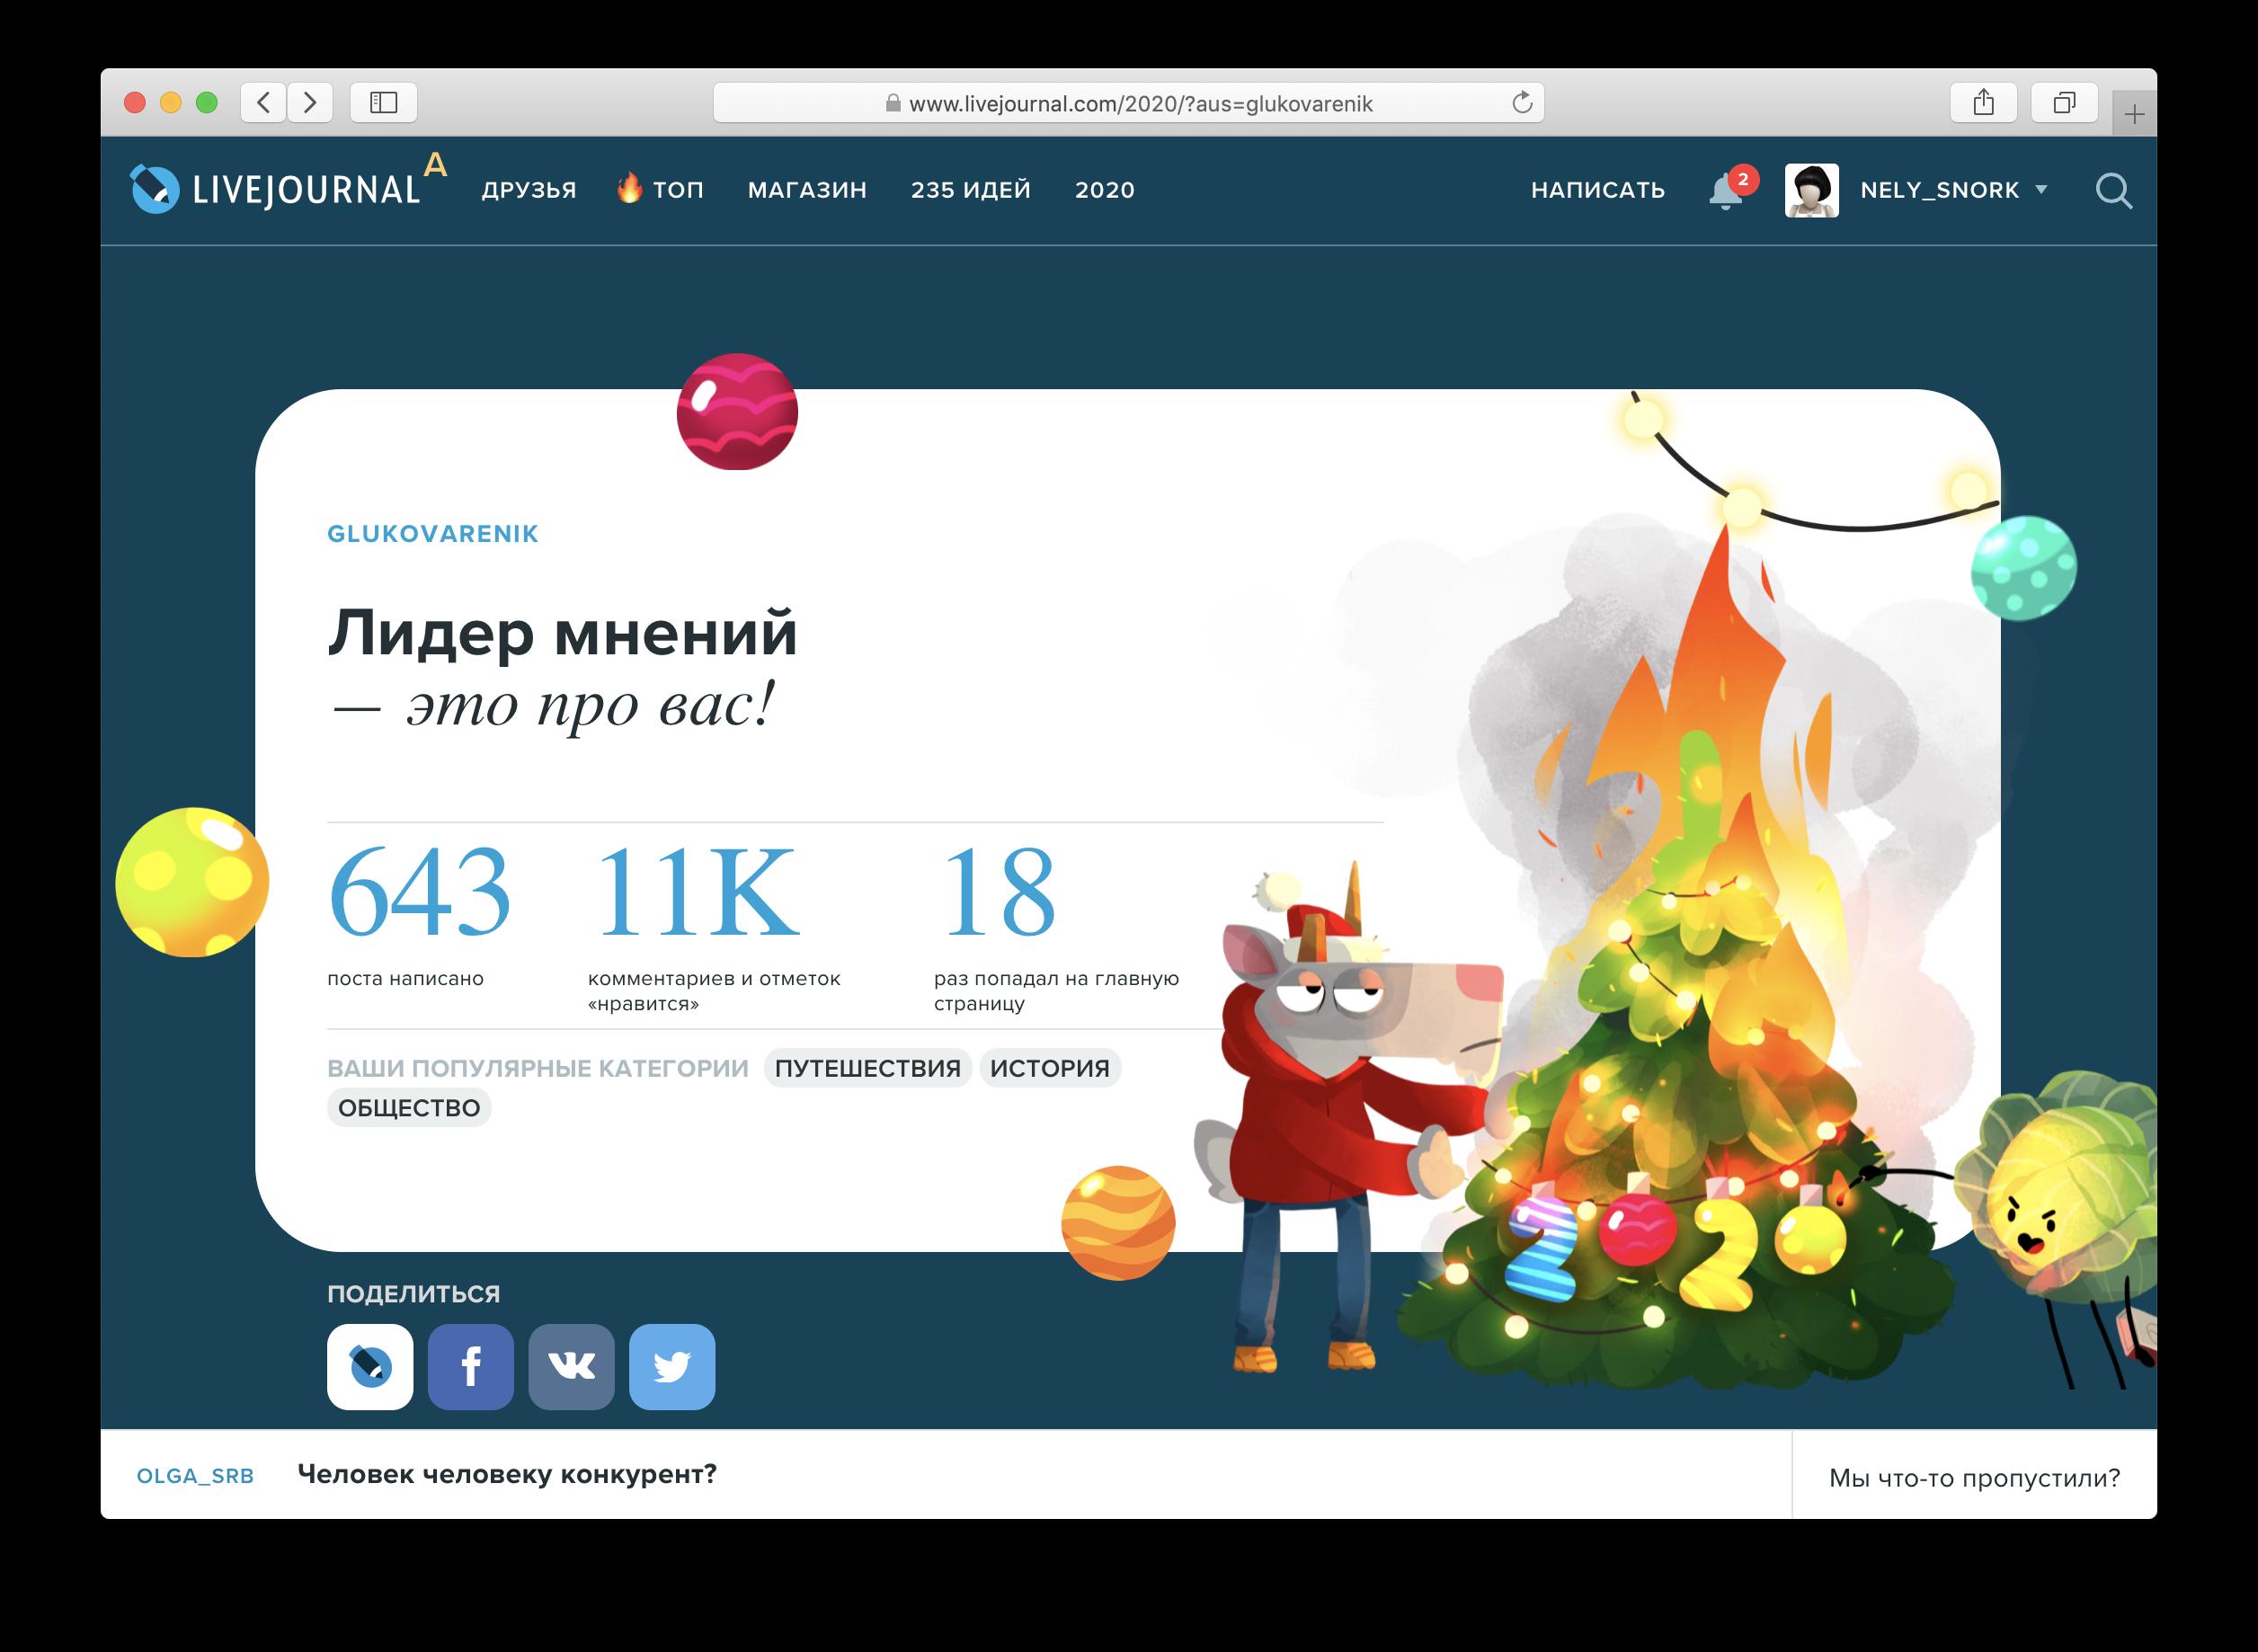 Подводим итоги года, строим планы на праздники и да, у нас горит елка https://www.livejournal.com/2020